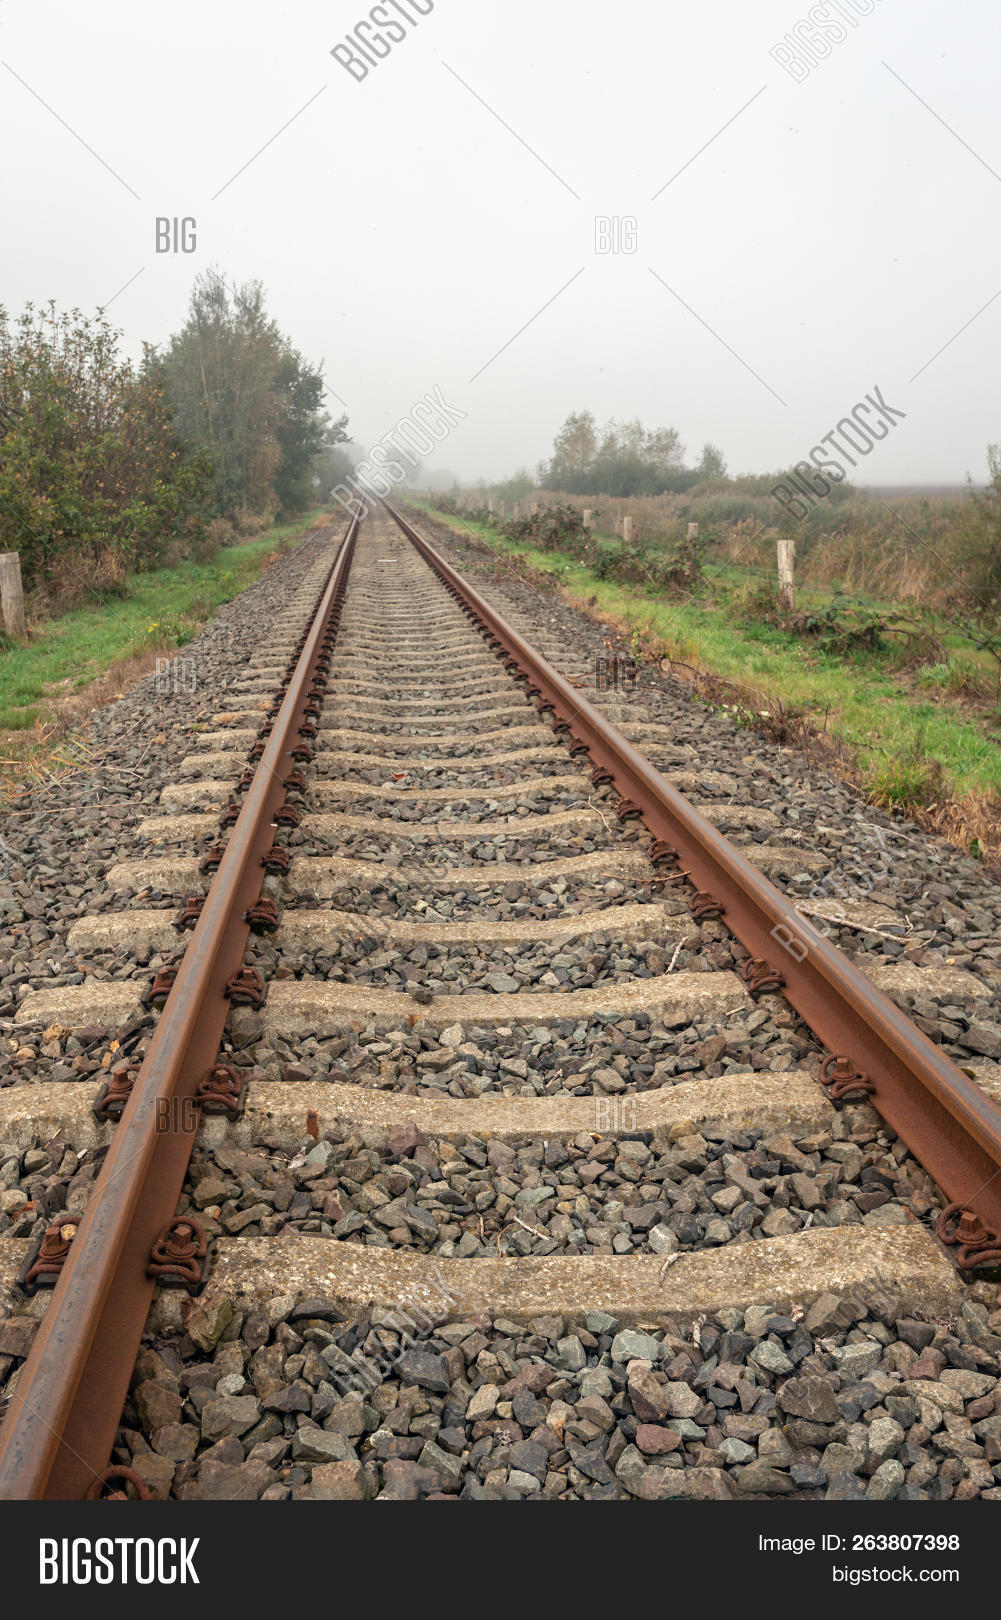 hight resolution of rusty single track image photo free trial bigstock single track wiring model train